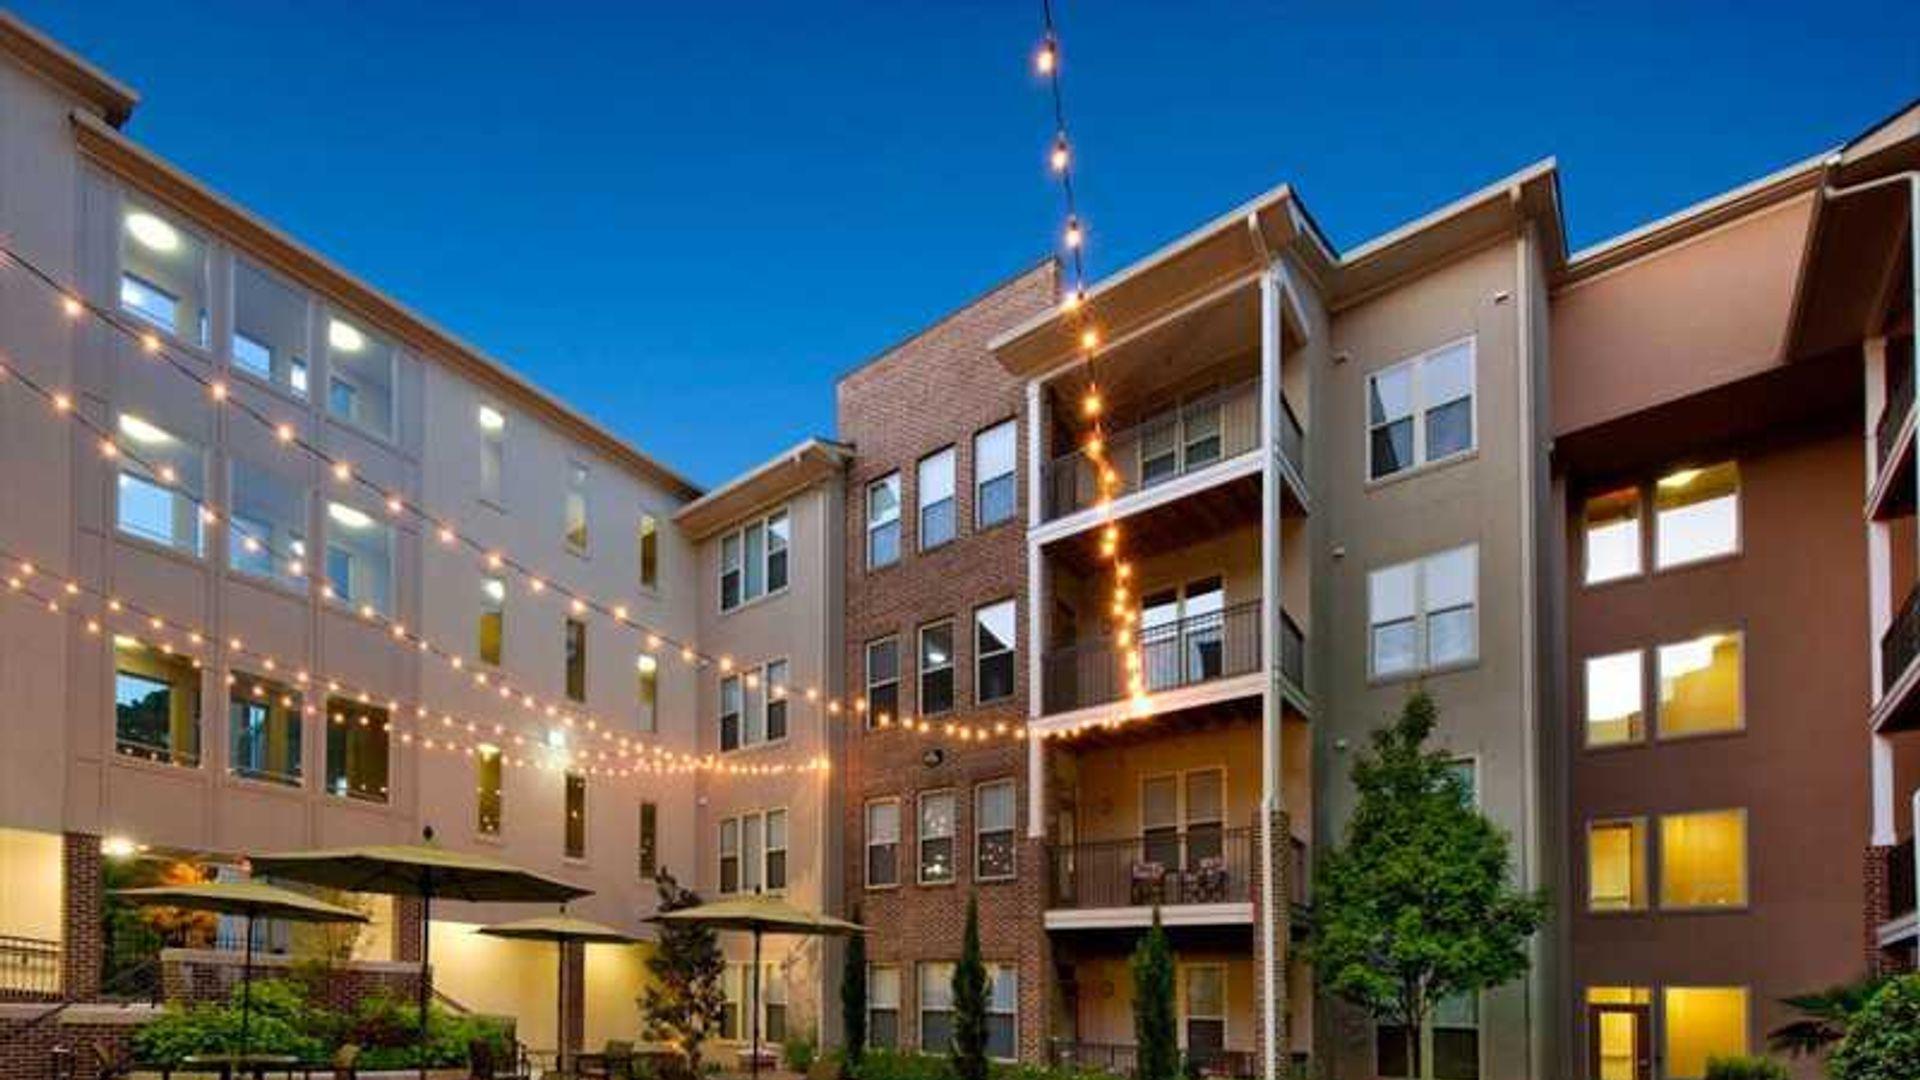 1 bed apartment at 737 lindbergh drive northeast atlanta